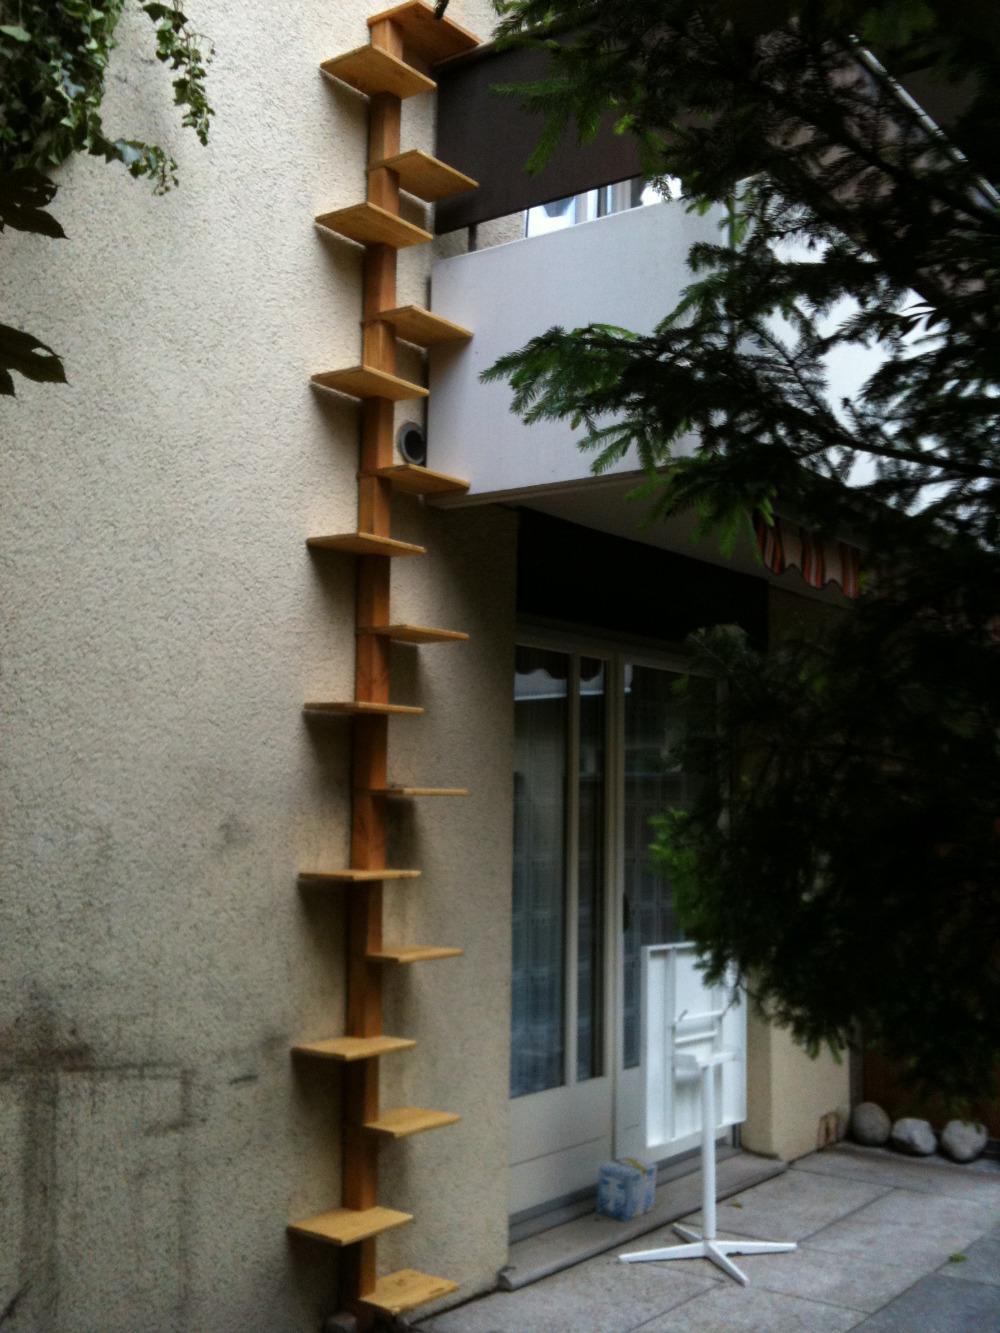 katzenleiter katzentreppe katzenwendeltreppe sr 200886. Black Bedroom Furniture Sets. Home Design Ideas